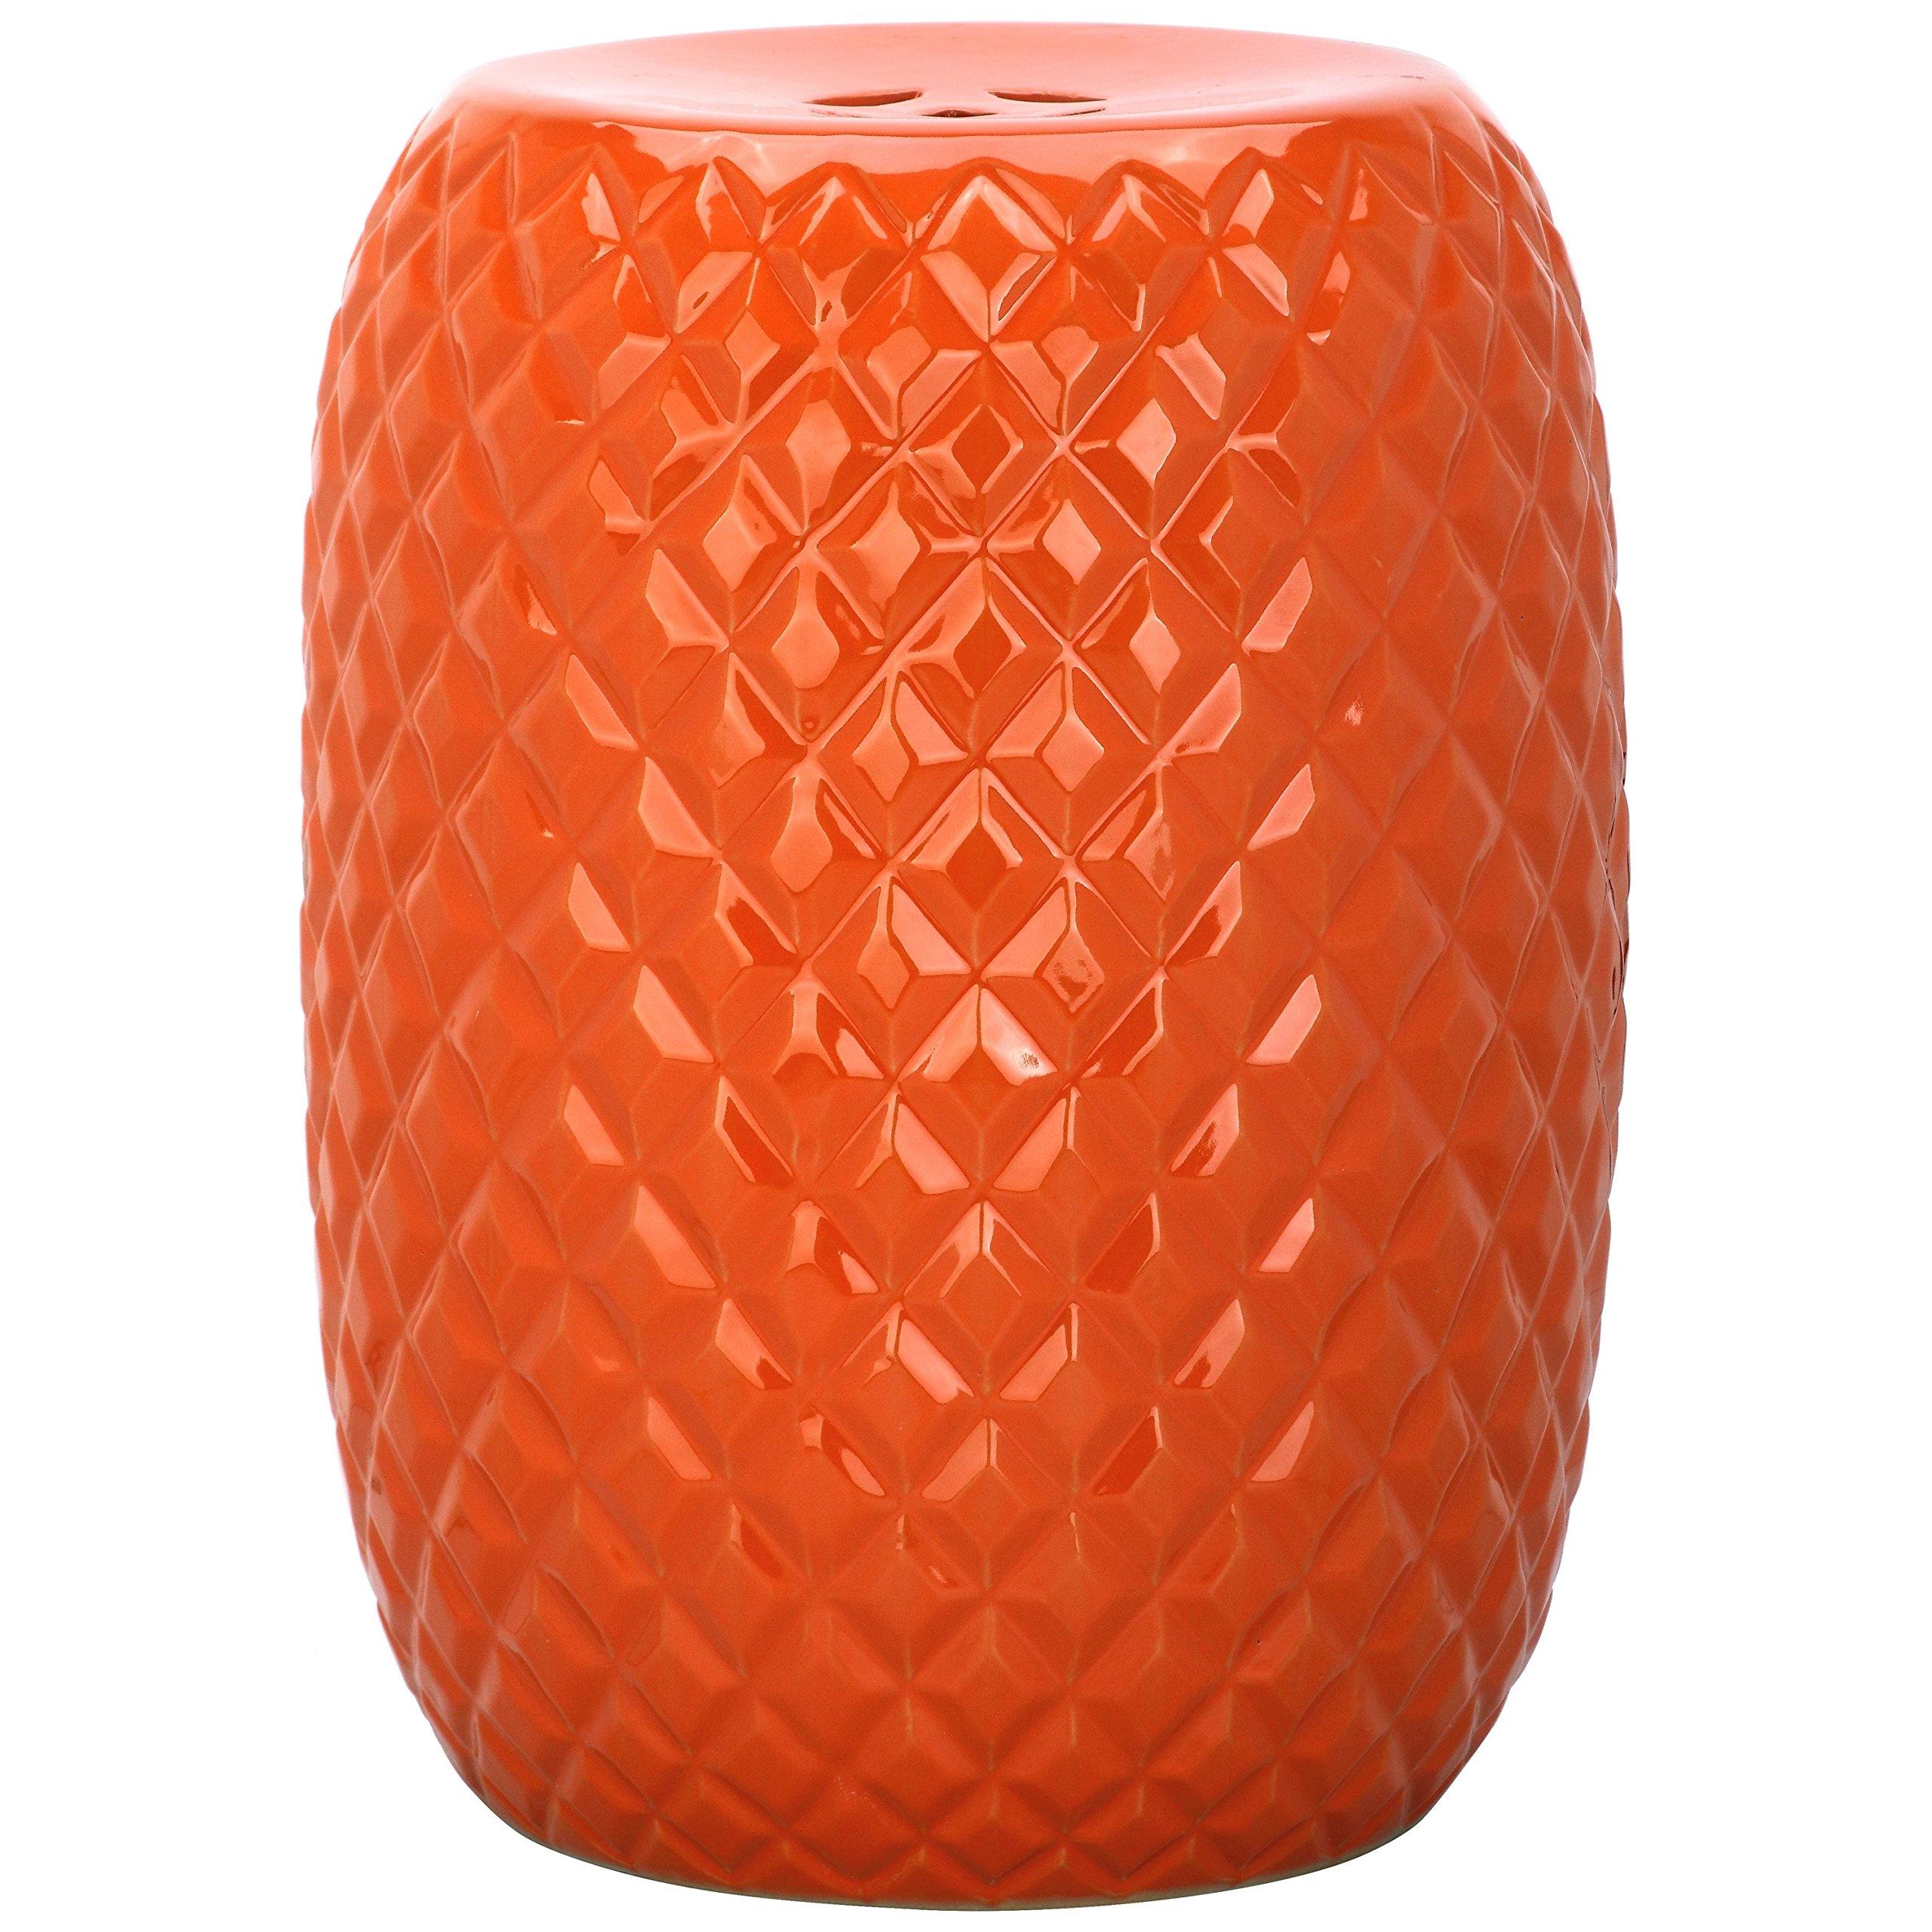 Safavieh Castle Gardens Collection Calla Orange Glazed Ceramic Garden Stool